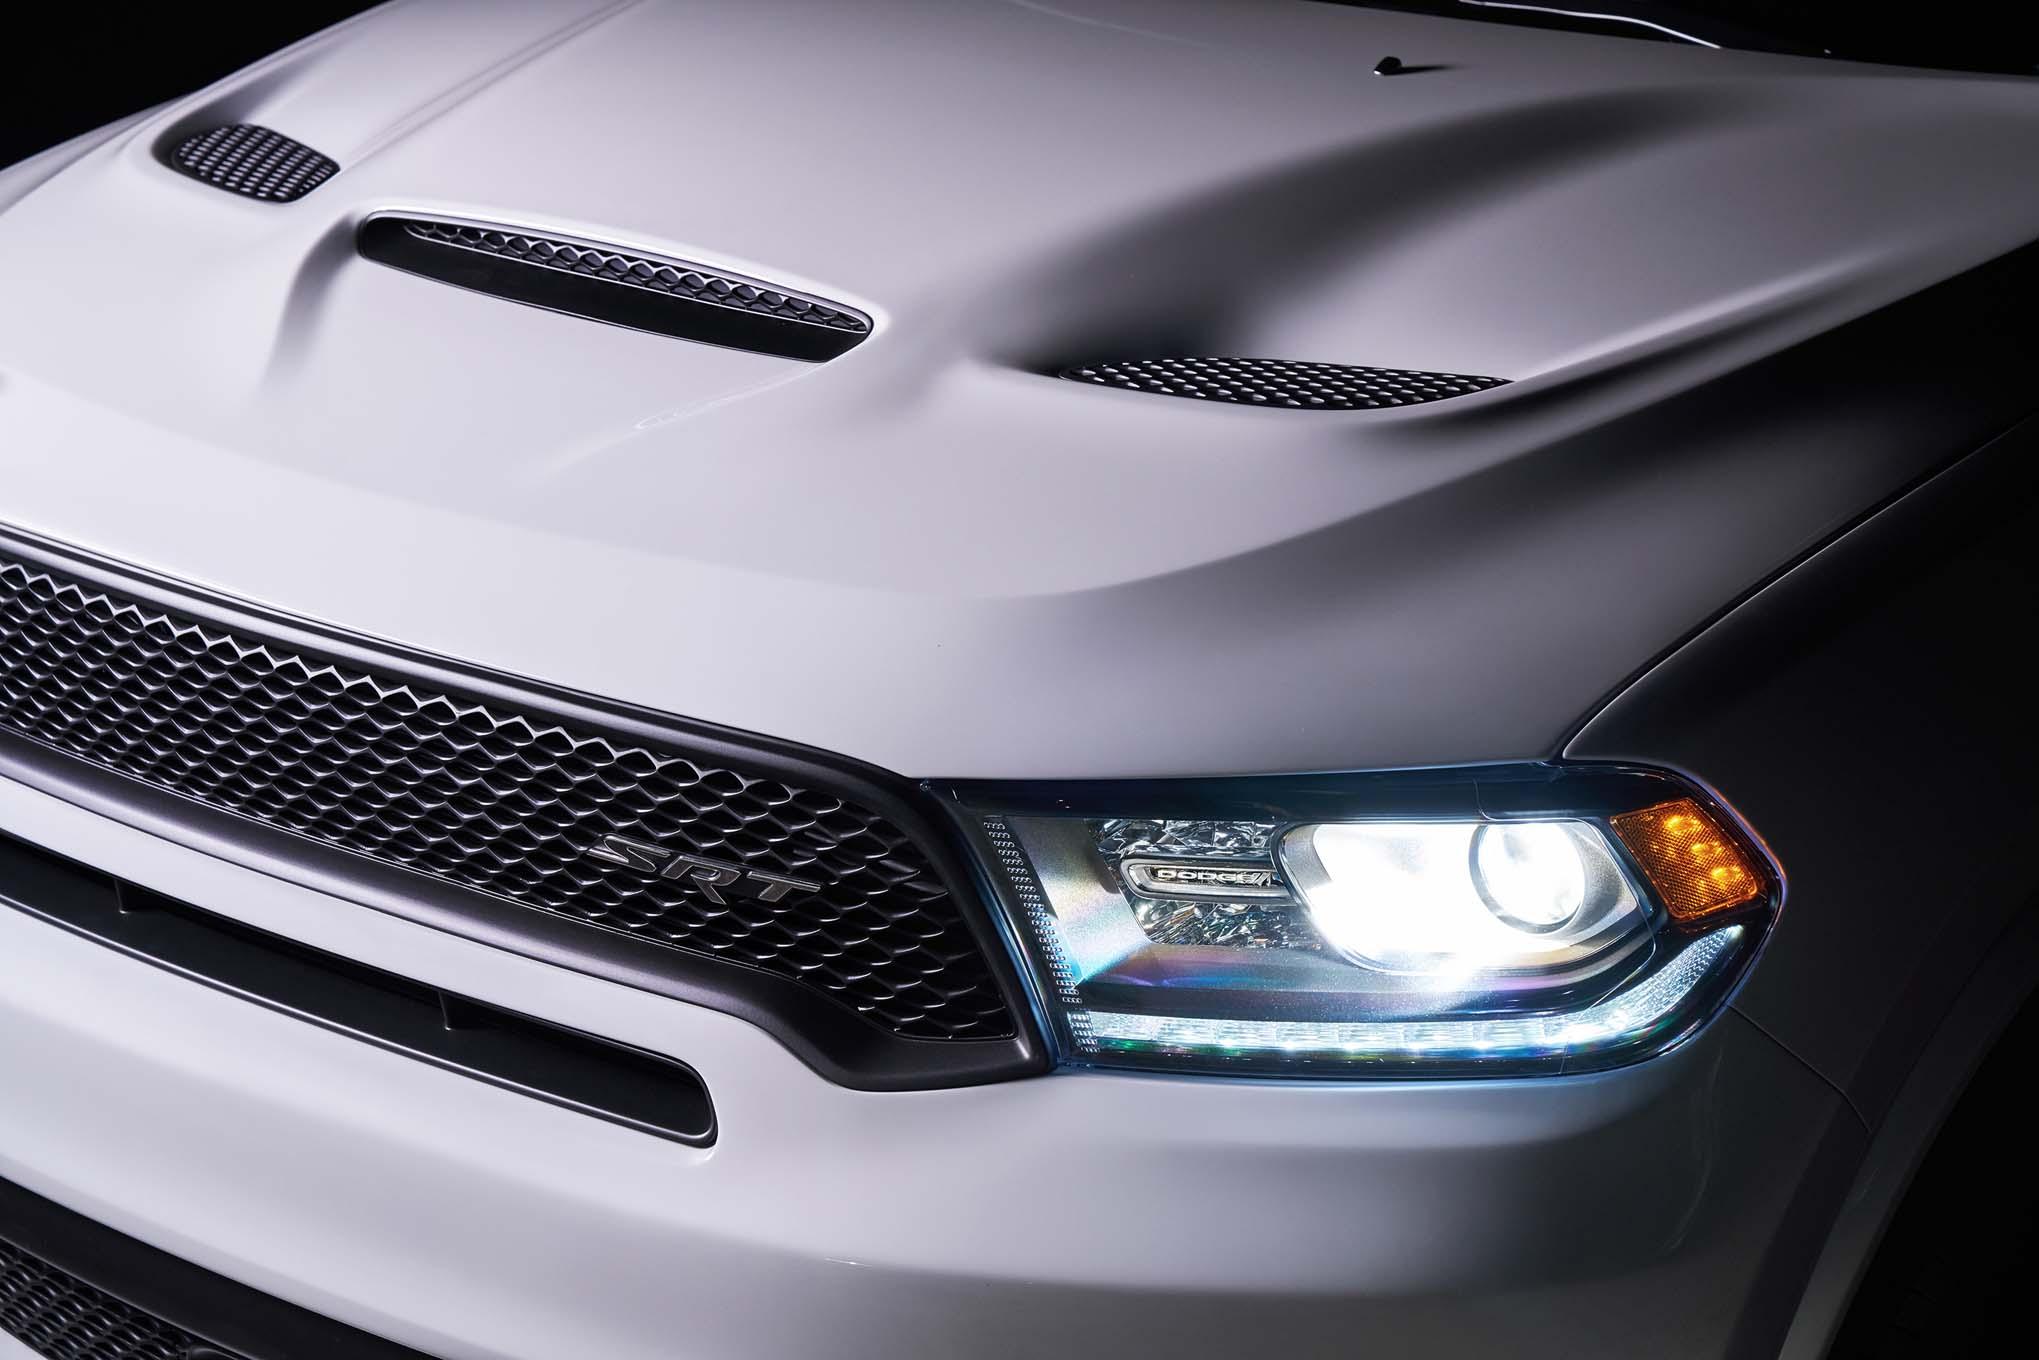 2018 Dodge Durango Srt Headlight